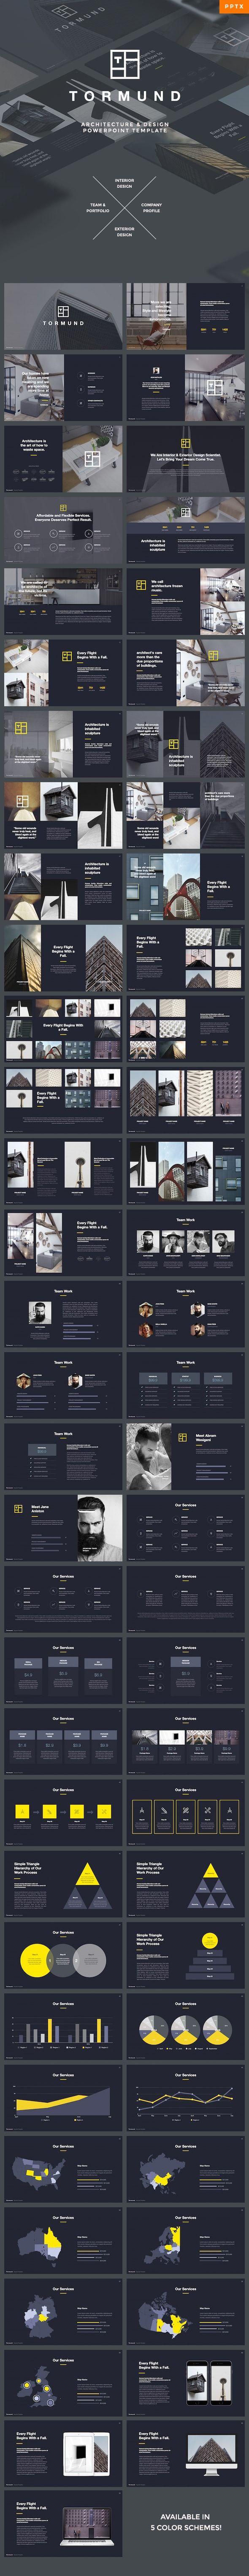 Thormund - Design & Portfolio Powerpoint Template | Design ...